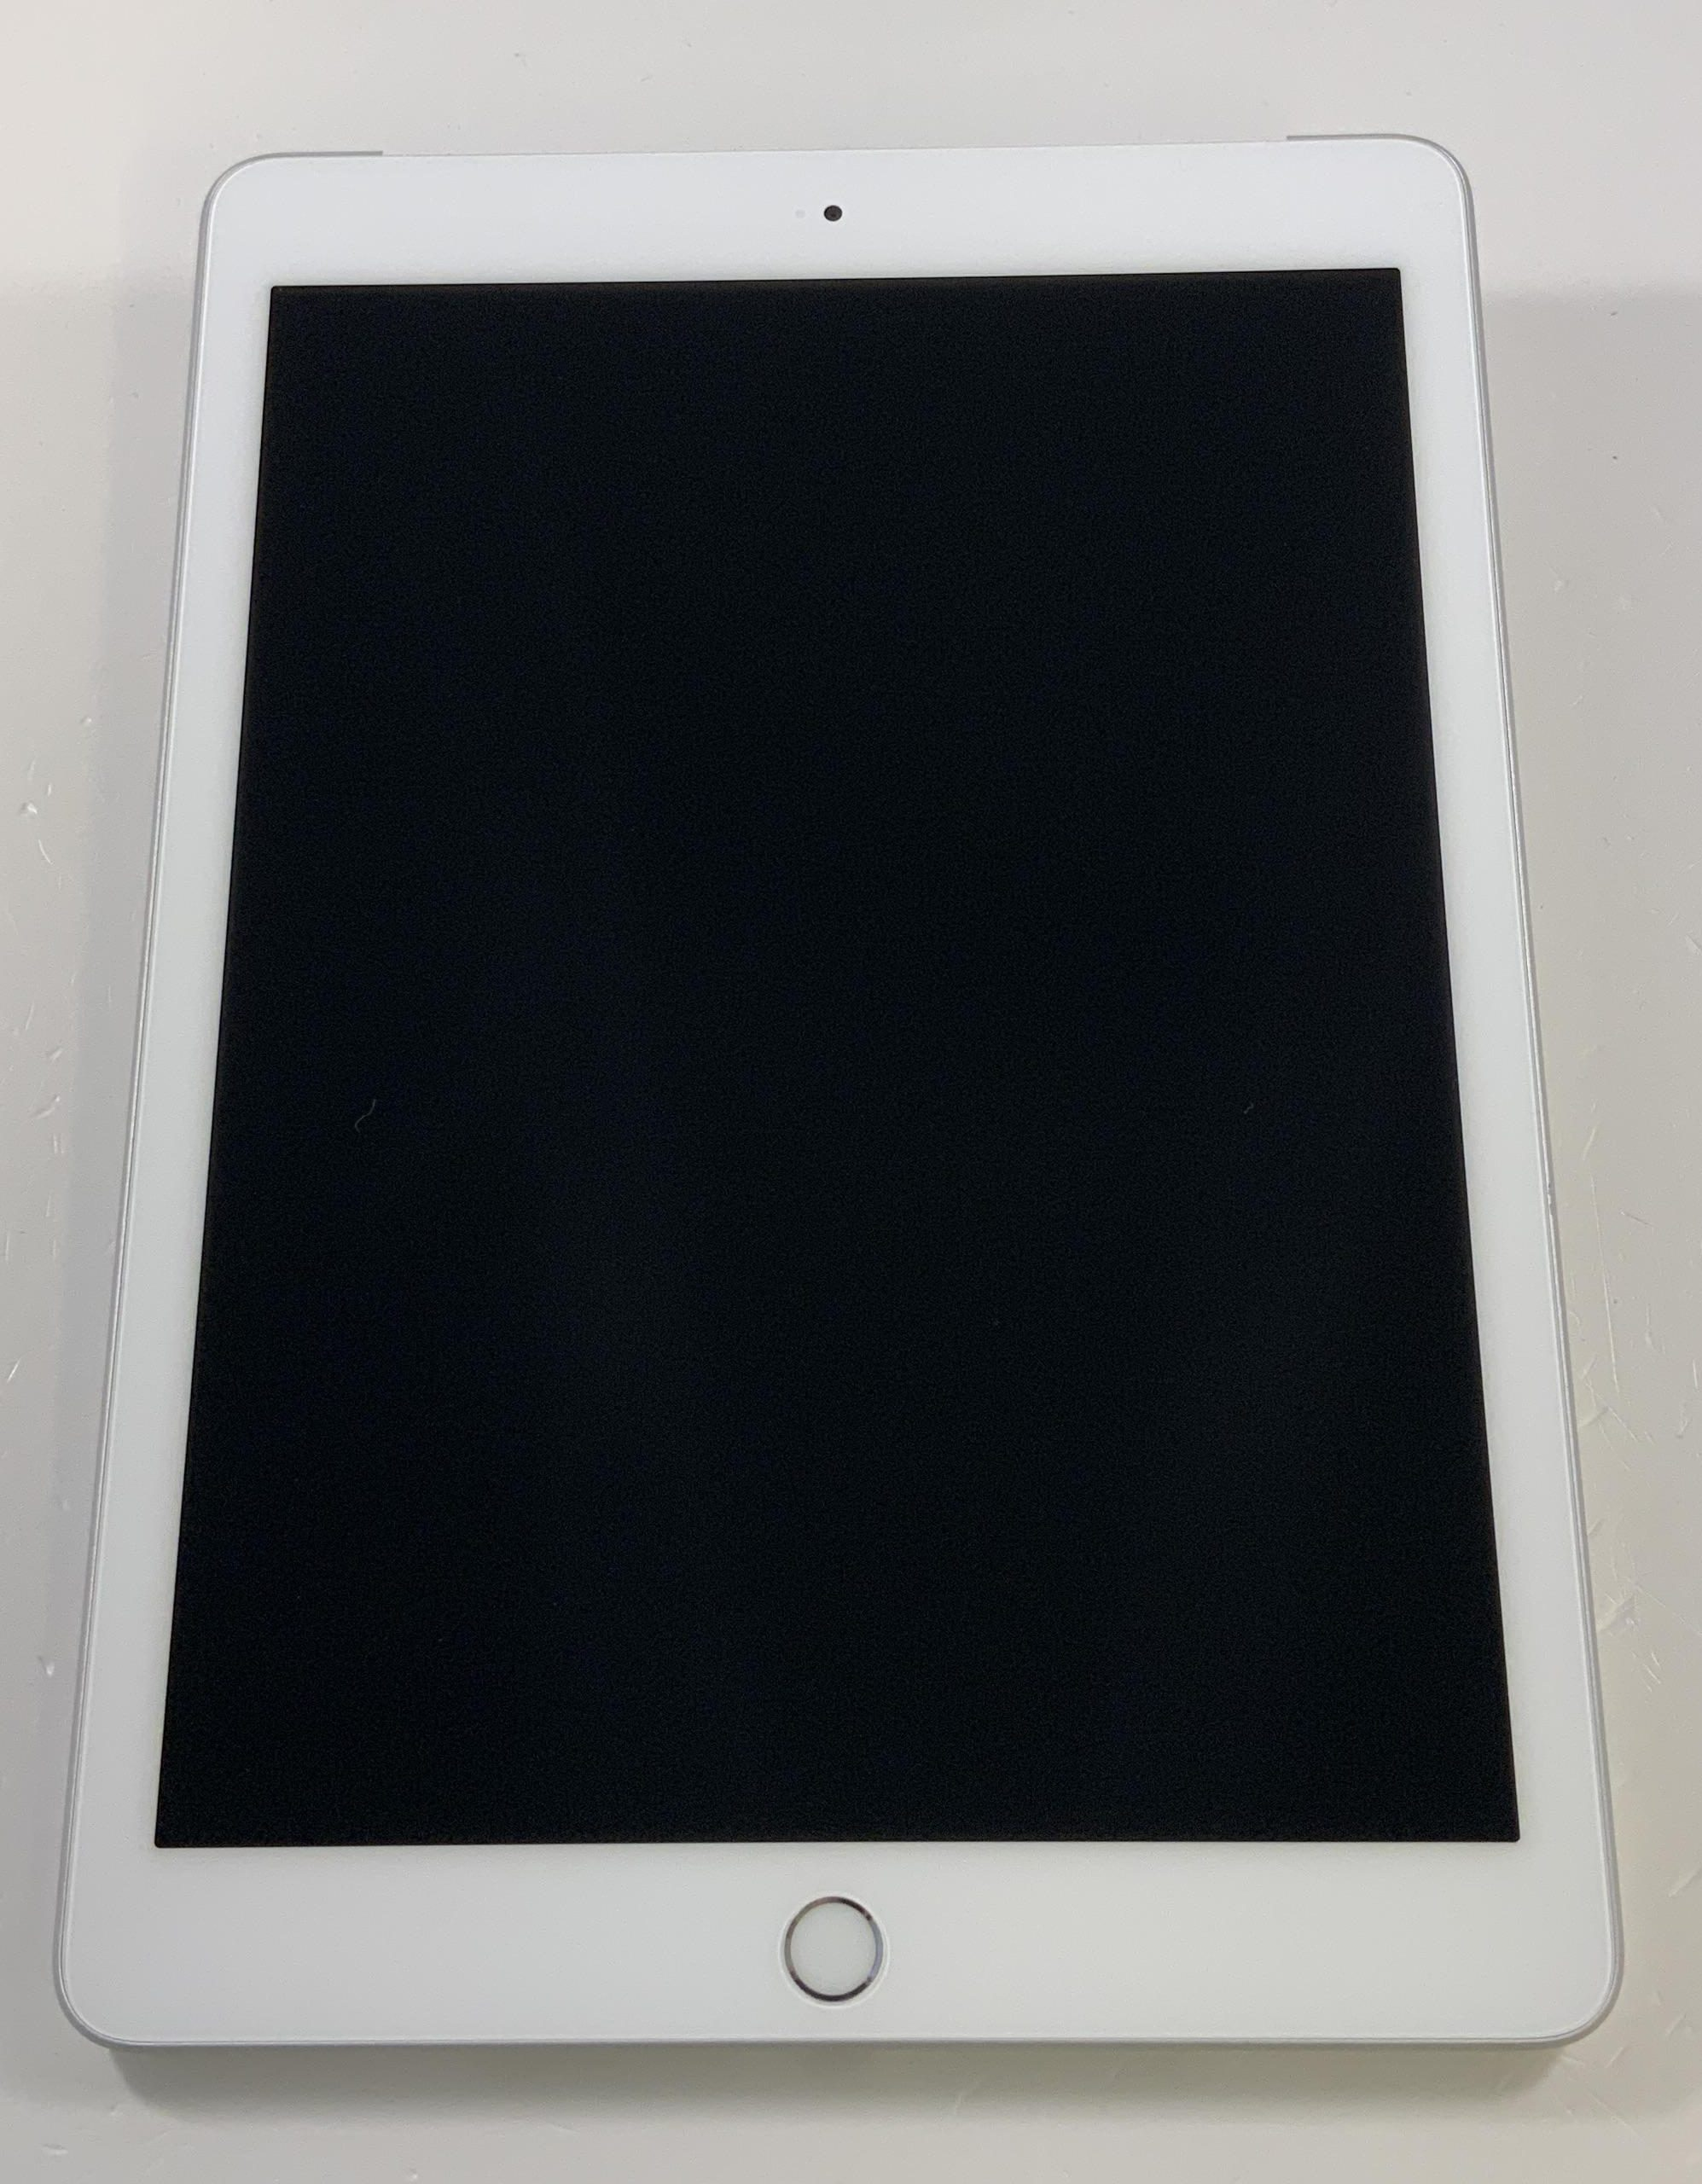 iPad 6 Wi-Fi + Cellular 32GB, 32GB, Silver, immagine 1